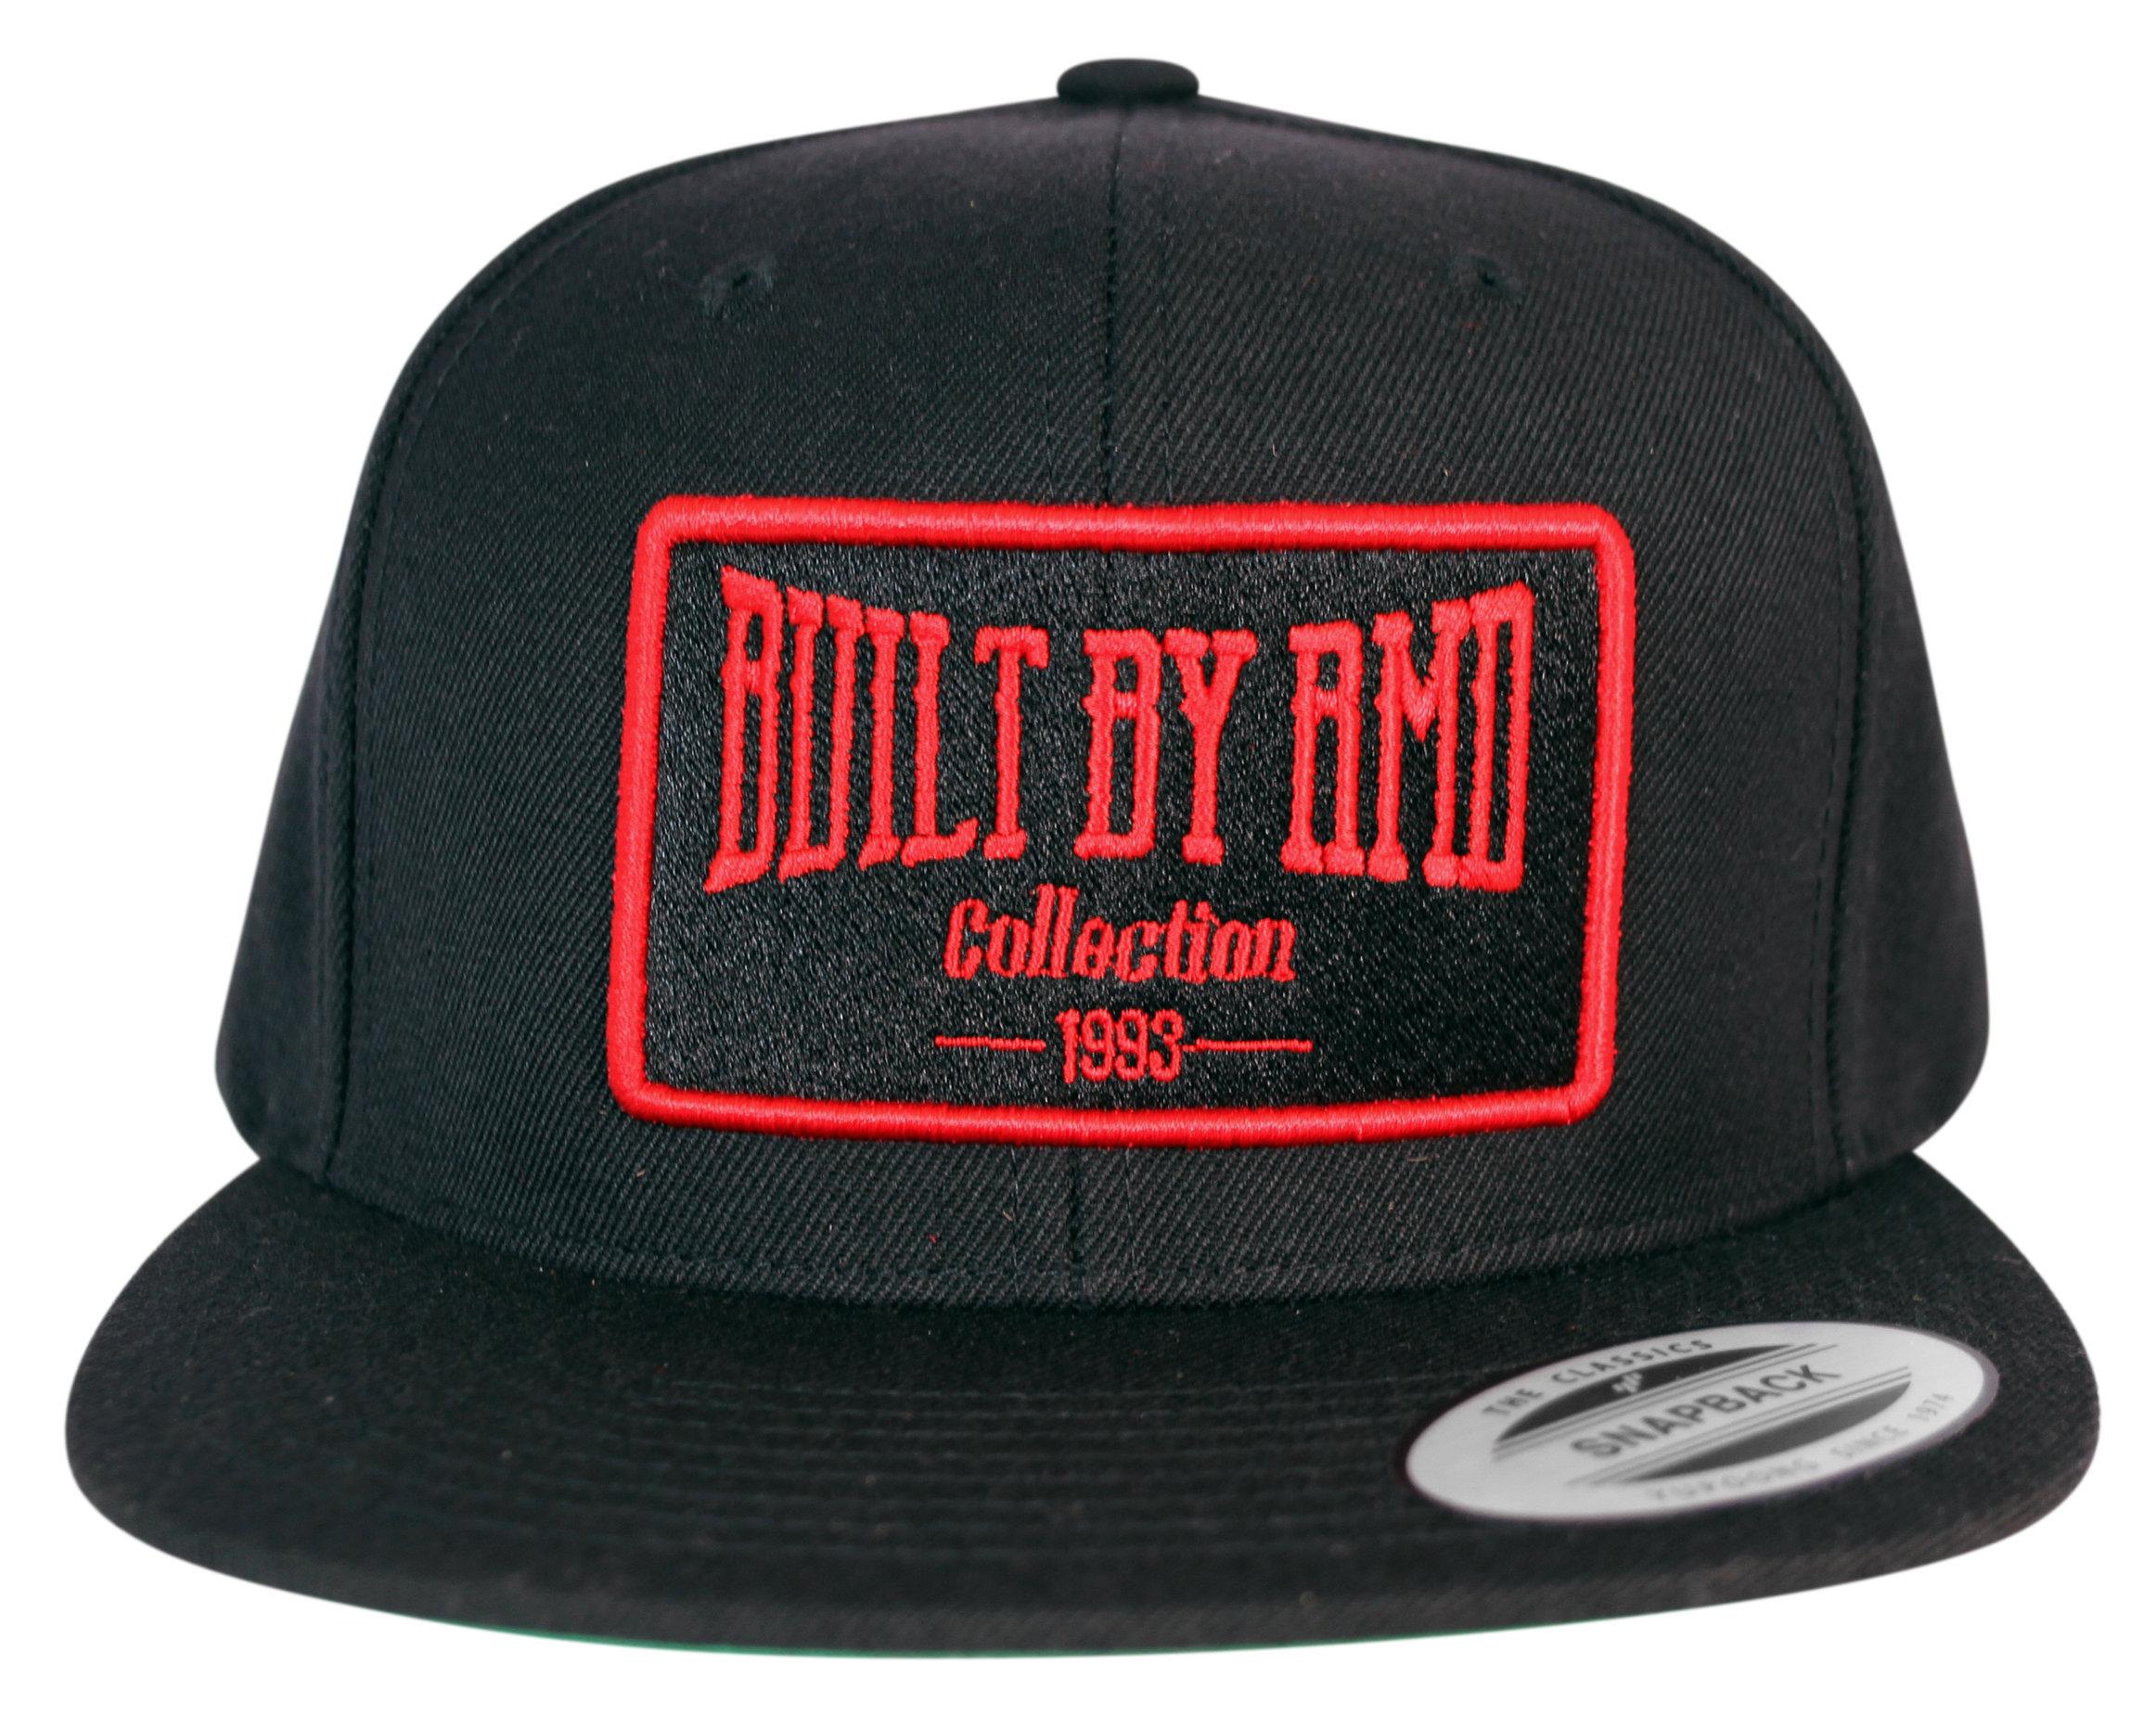 Built By RMD Cap  Red on Black Snap Back 001R1800SBR